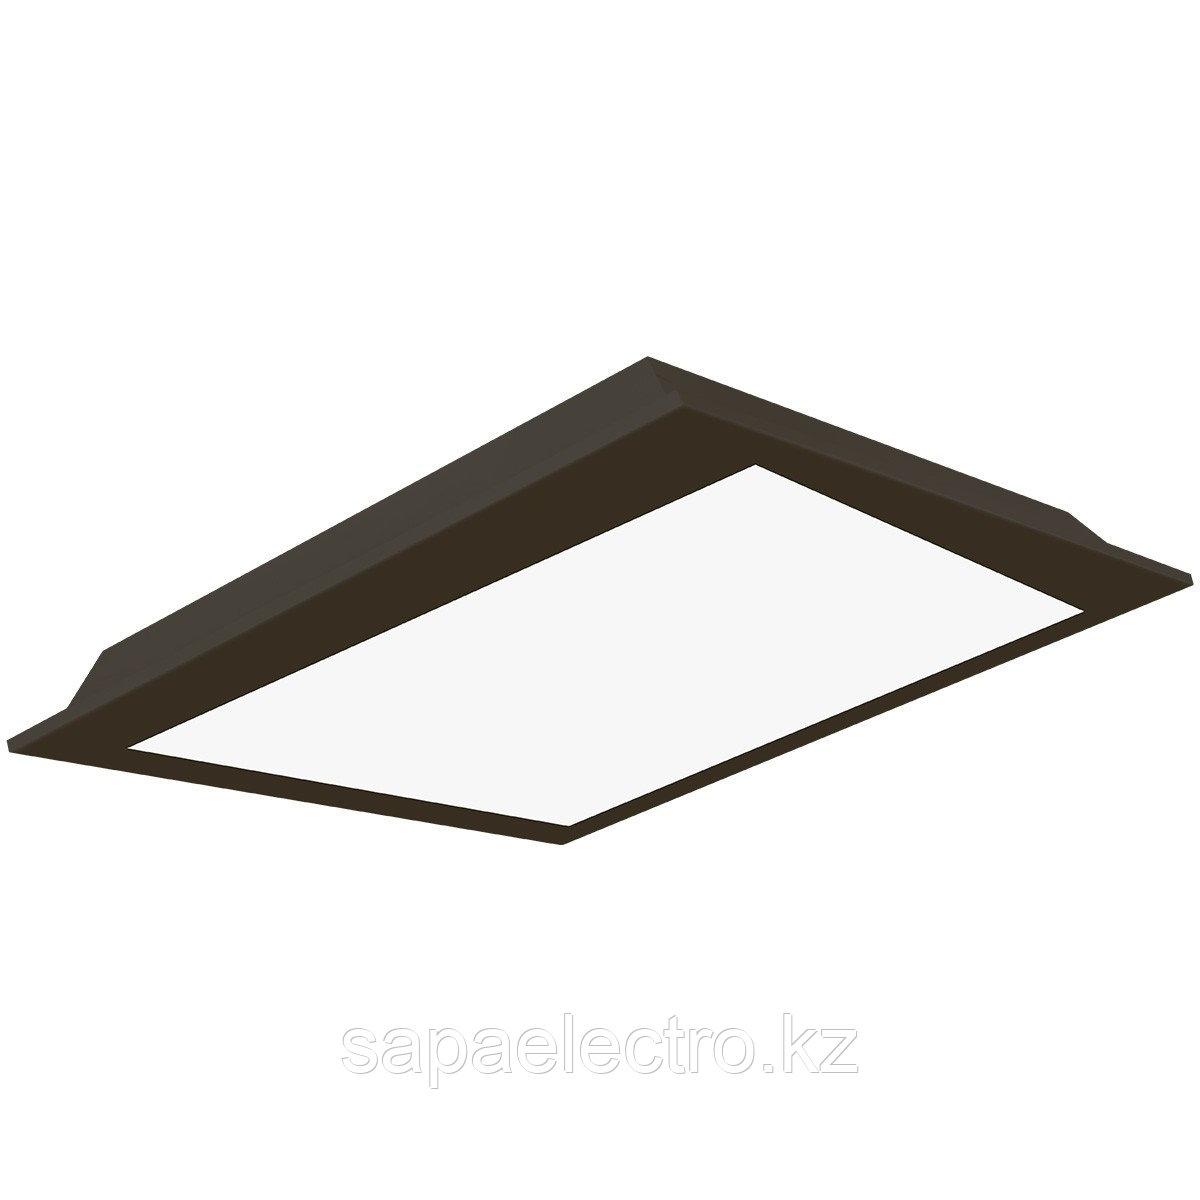 Св-к  OPALLED FRAME 48W BLACK S/A  600x600 5700K  M